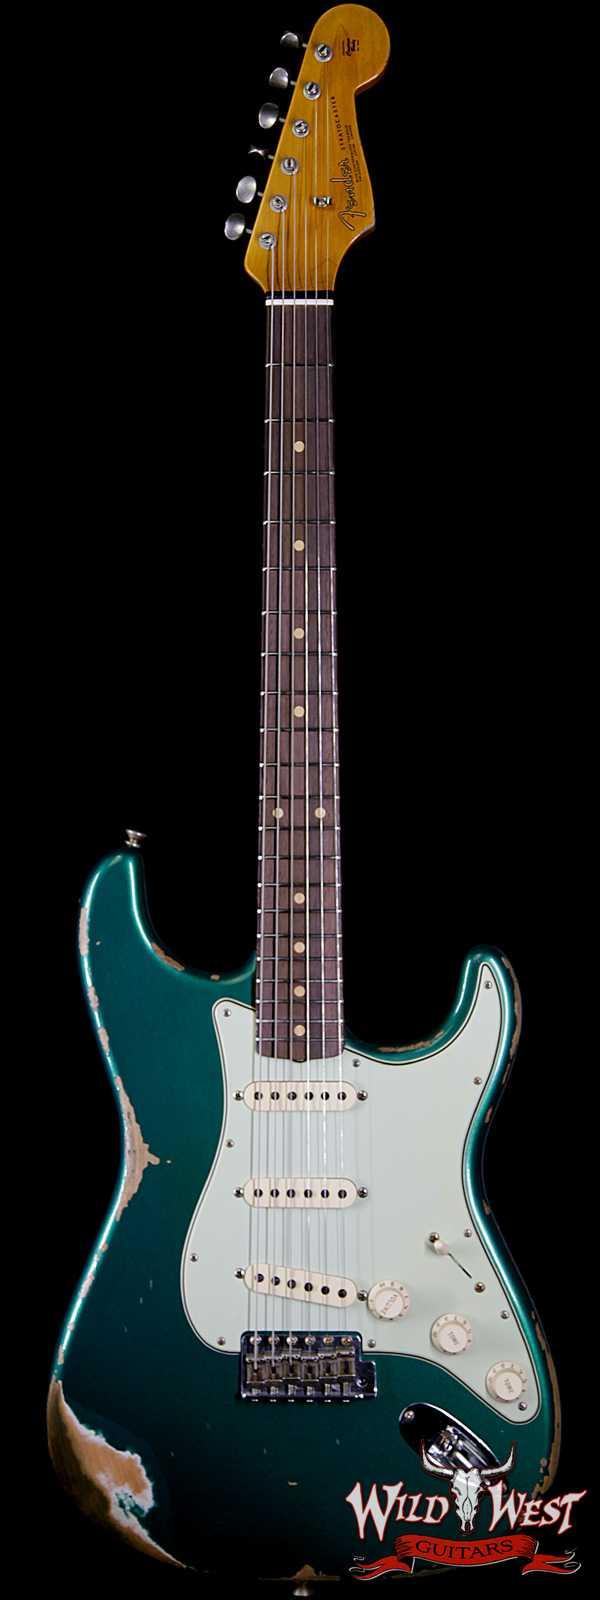 Fender Custom Shop 1963 Stratocaster AAA Rosewood Fingerboard Heavy Relic British Racing Green